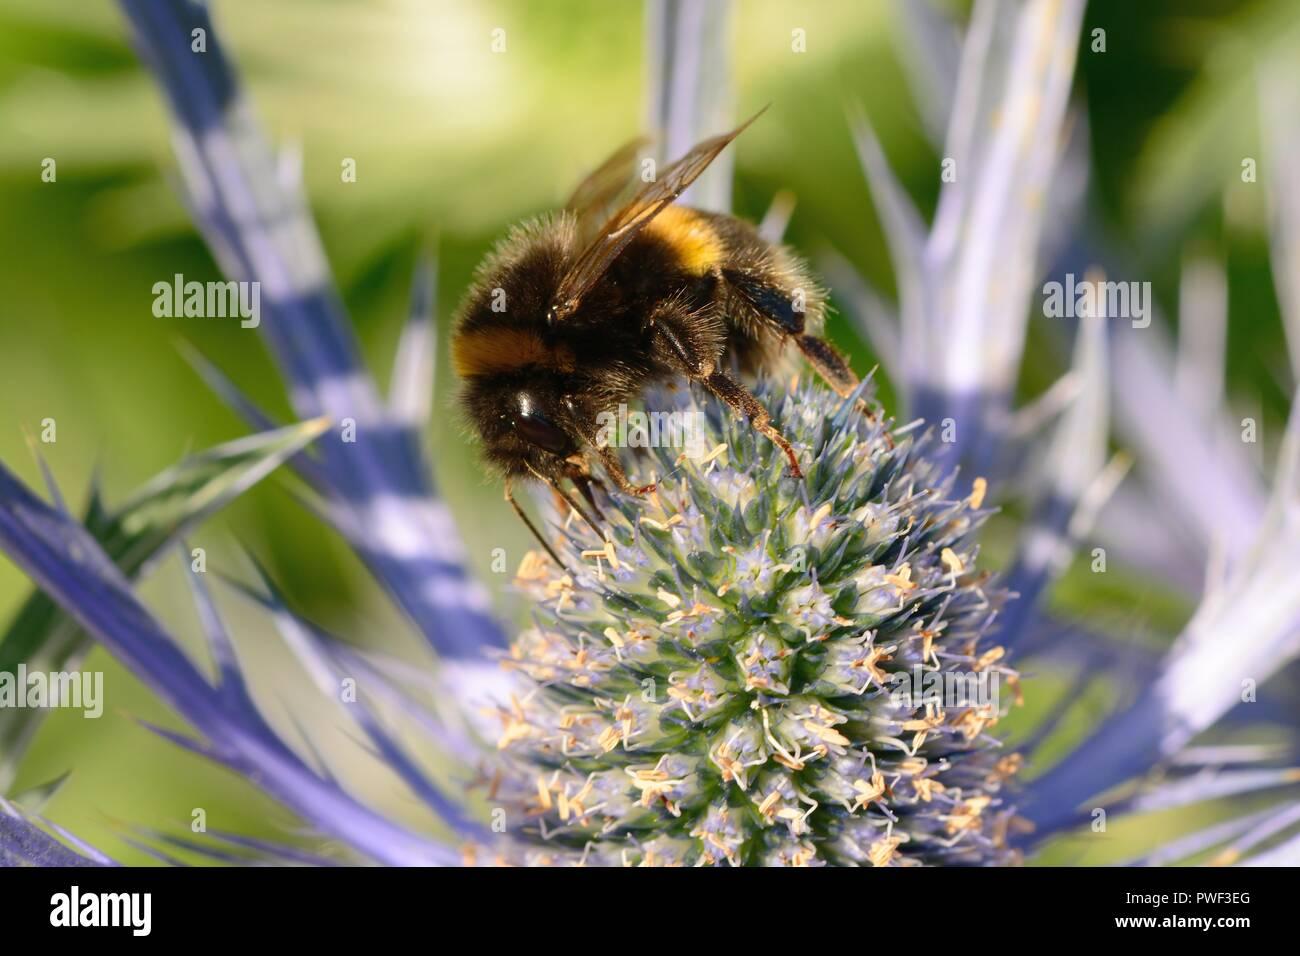 Macro shot of a bee pollinating an eryngium (eryngium amethystinium) flower - Stock Image